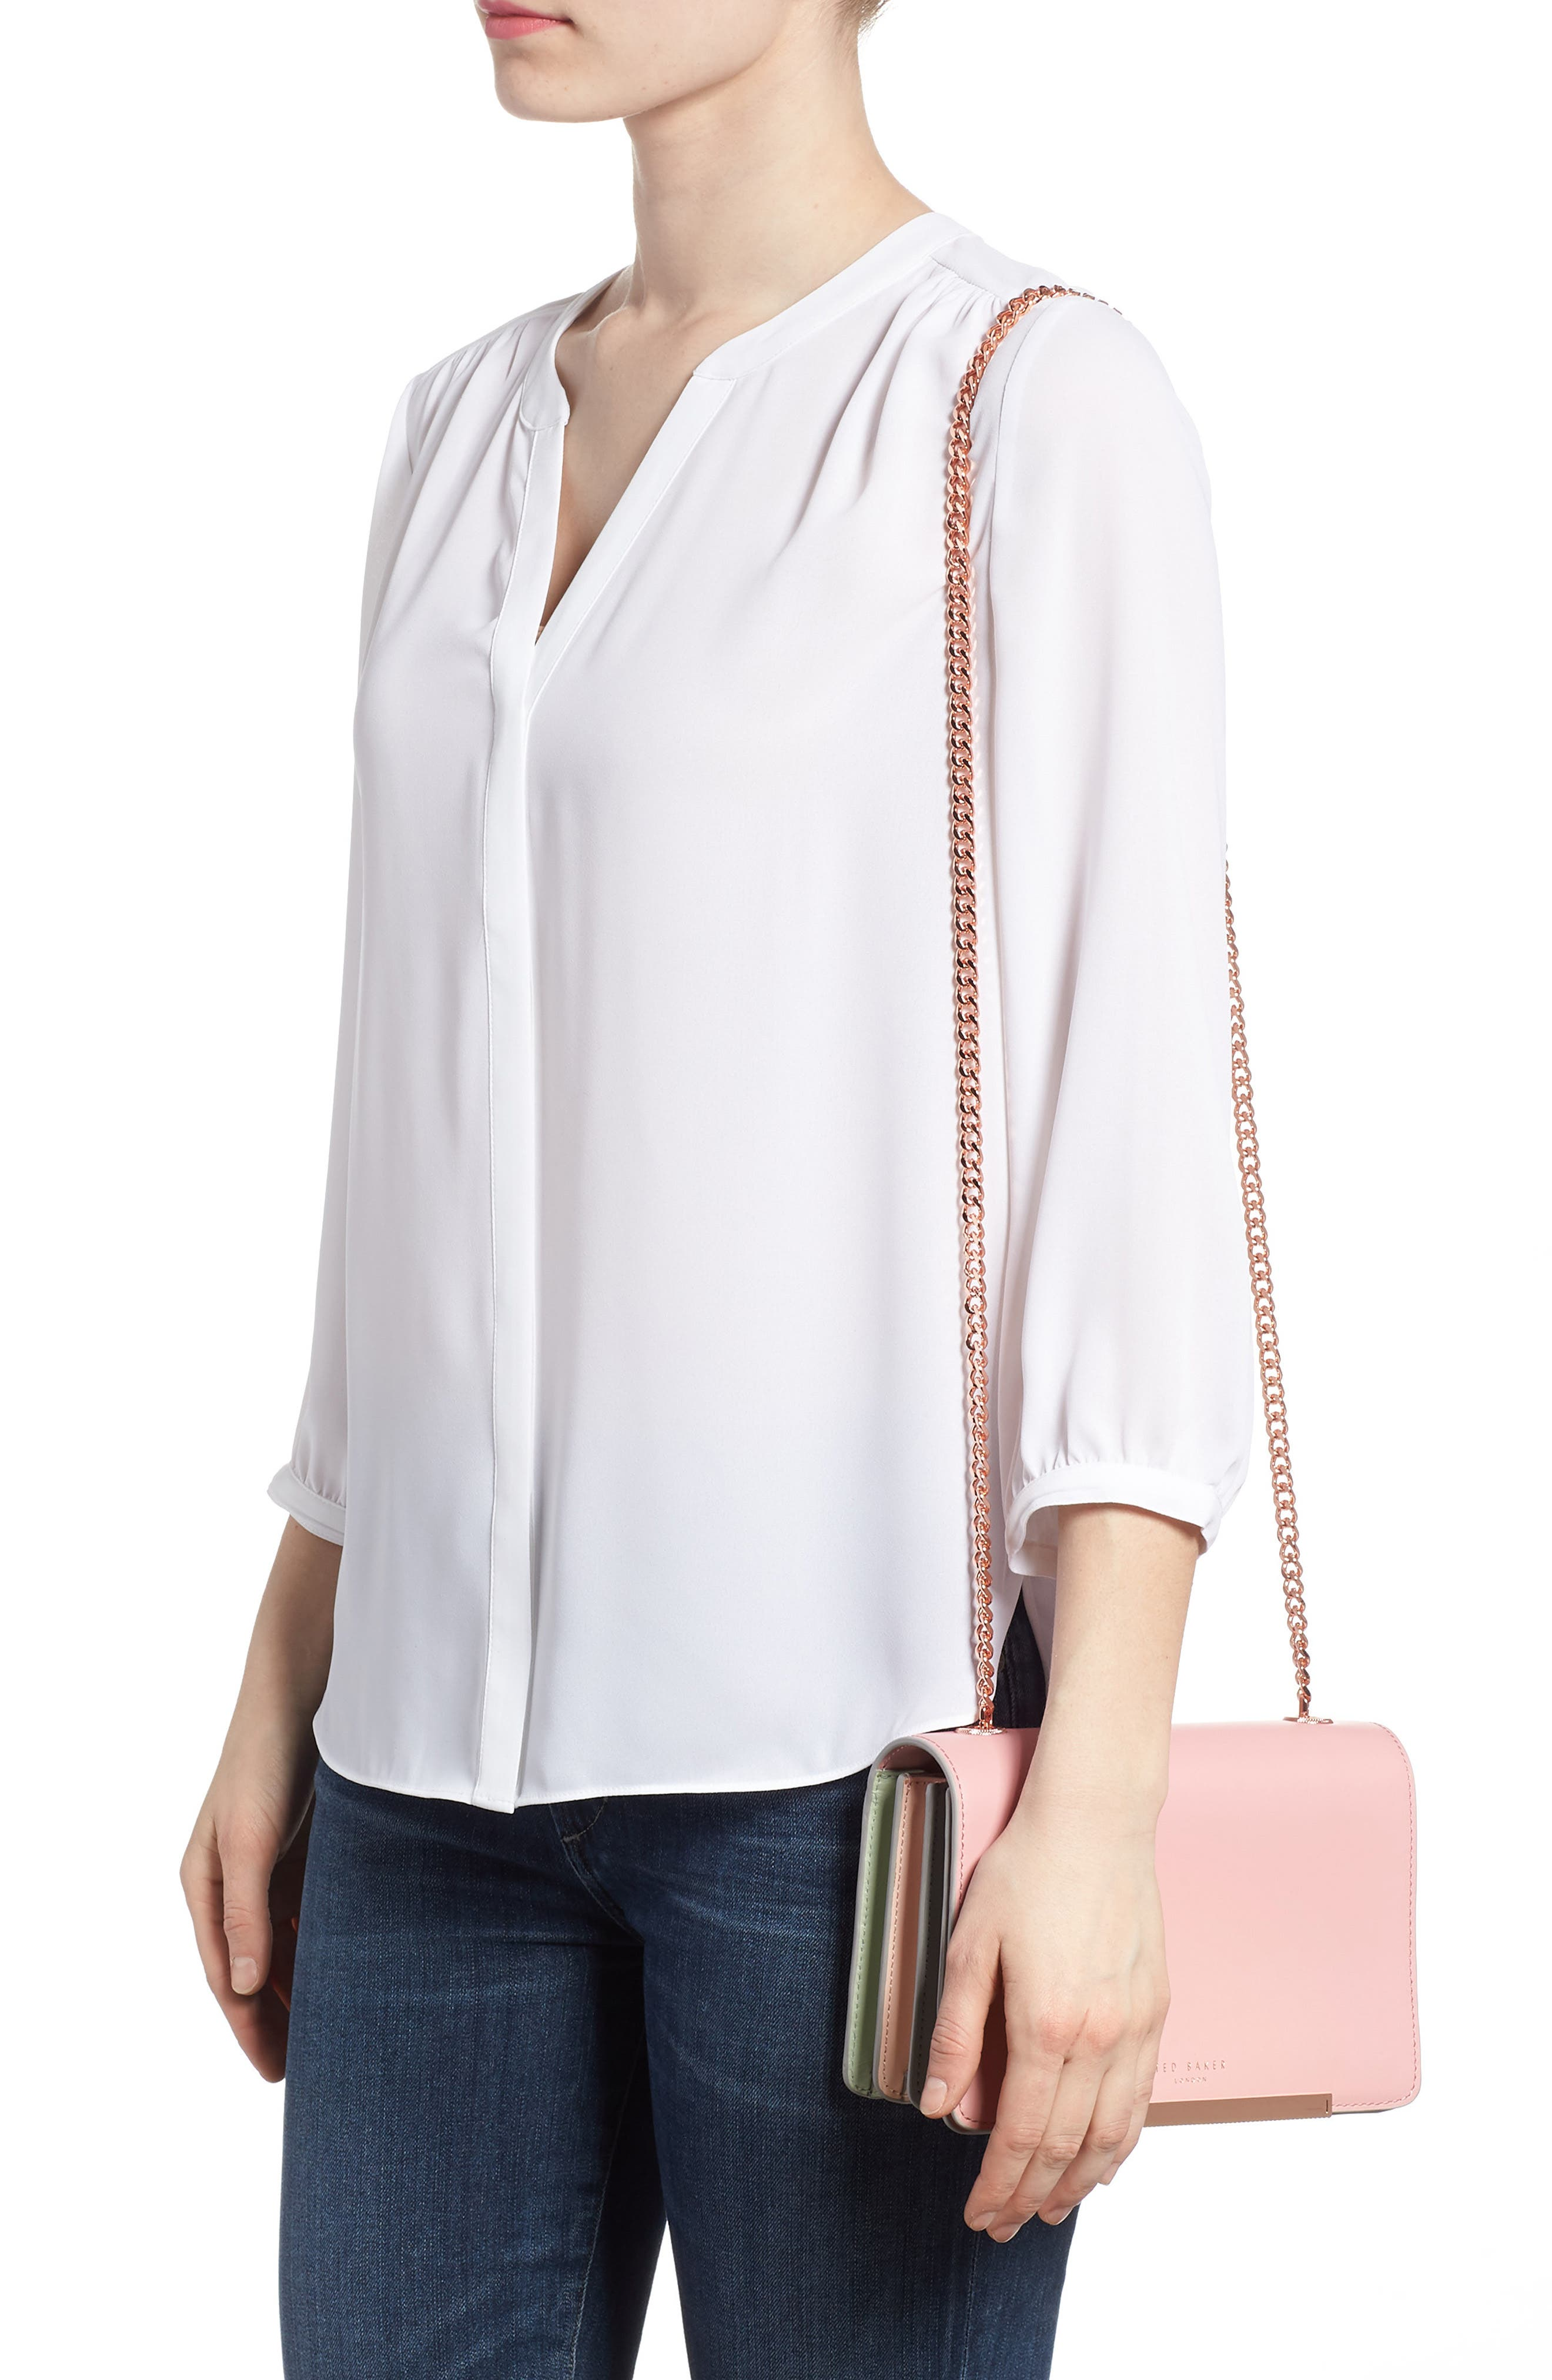 Earie Leather Crossbody Bag,                             Alternate thumbnail 2, color,                             Dusky Pink